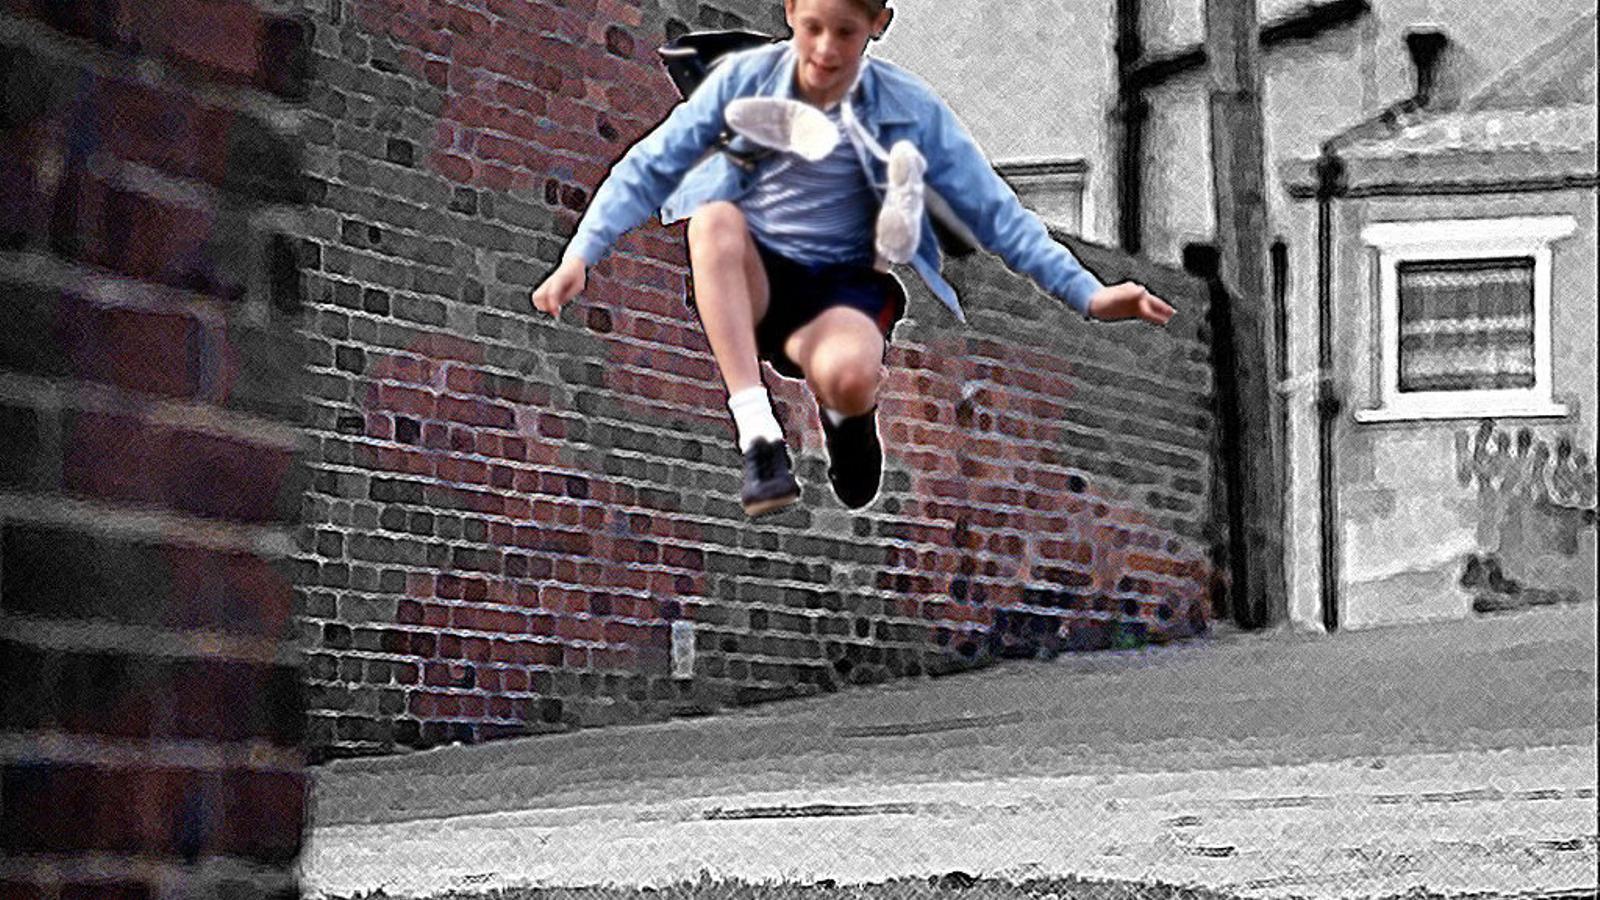 'Fama, a bailar' i la lliçó de Billy Elliot